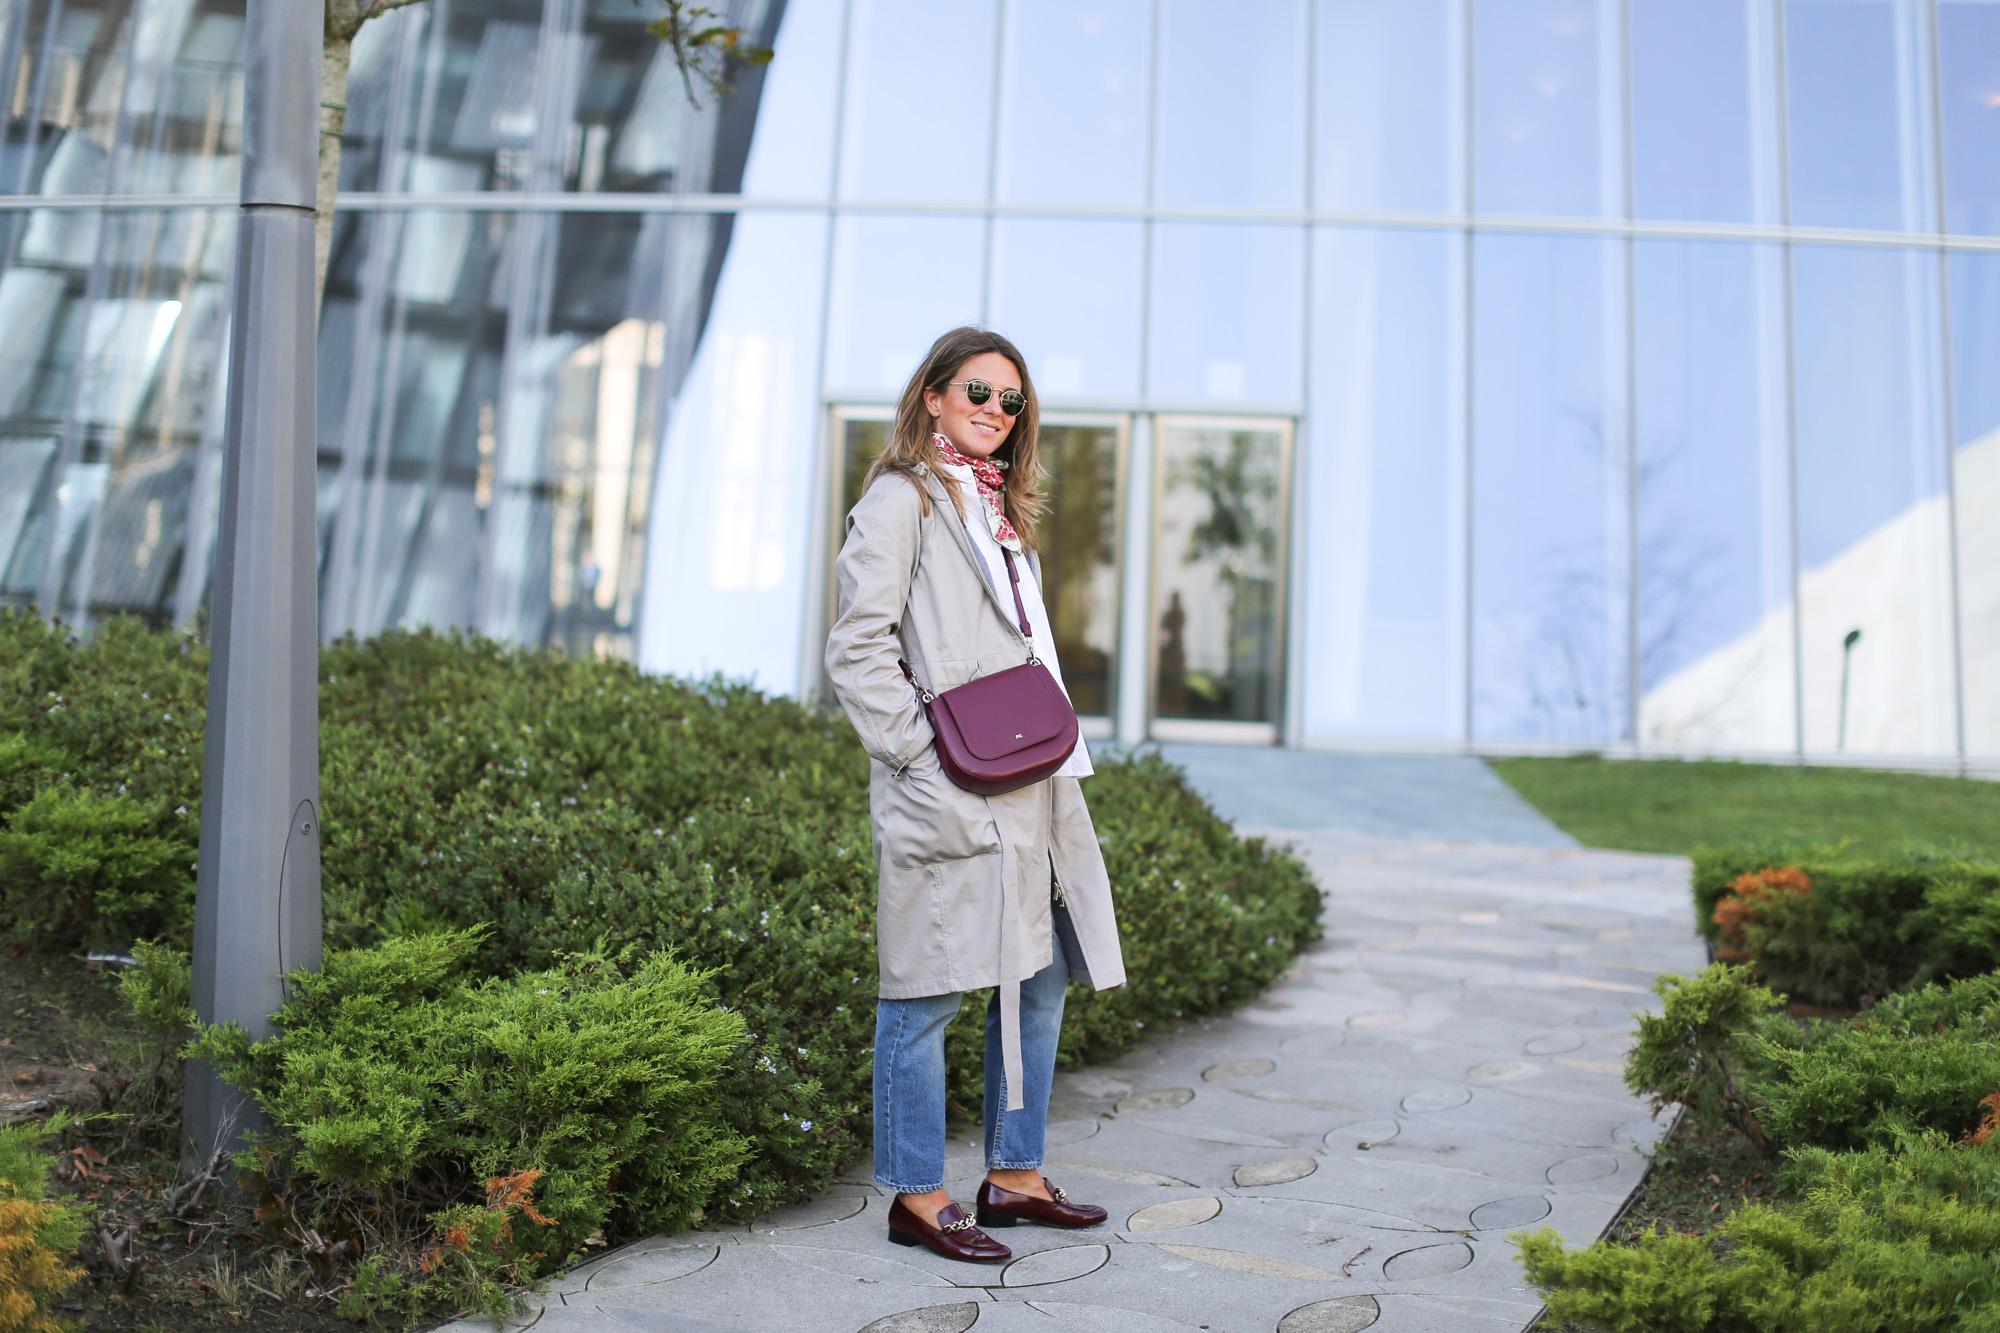 Clochet_streetstyle_fashionblogger_purificaciongarcia_pgbacktothecity_bandolerapielwestfalia_mocasinespielgranates-2